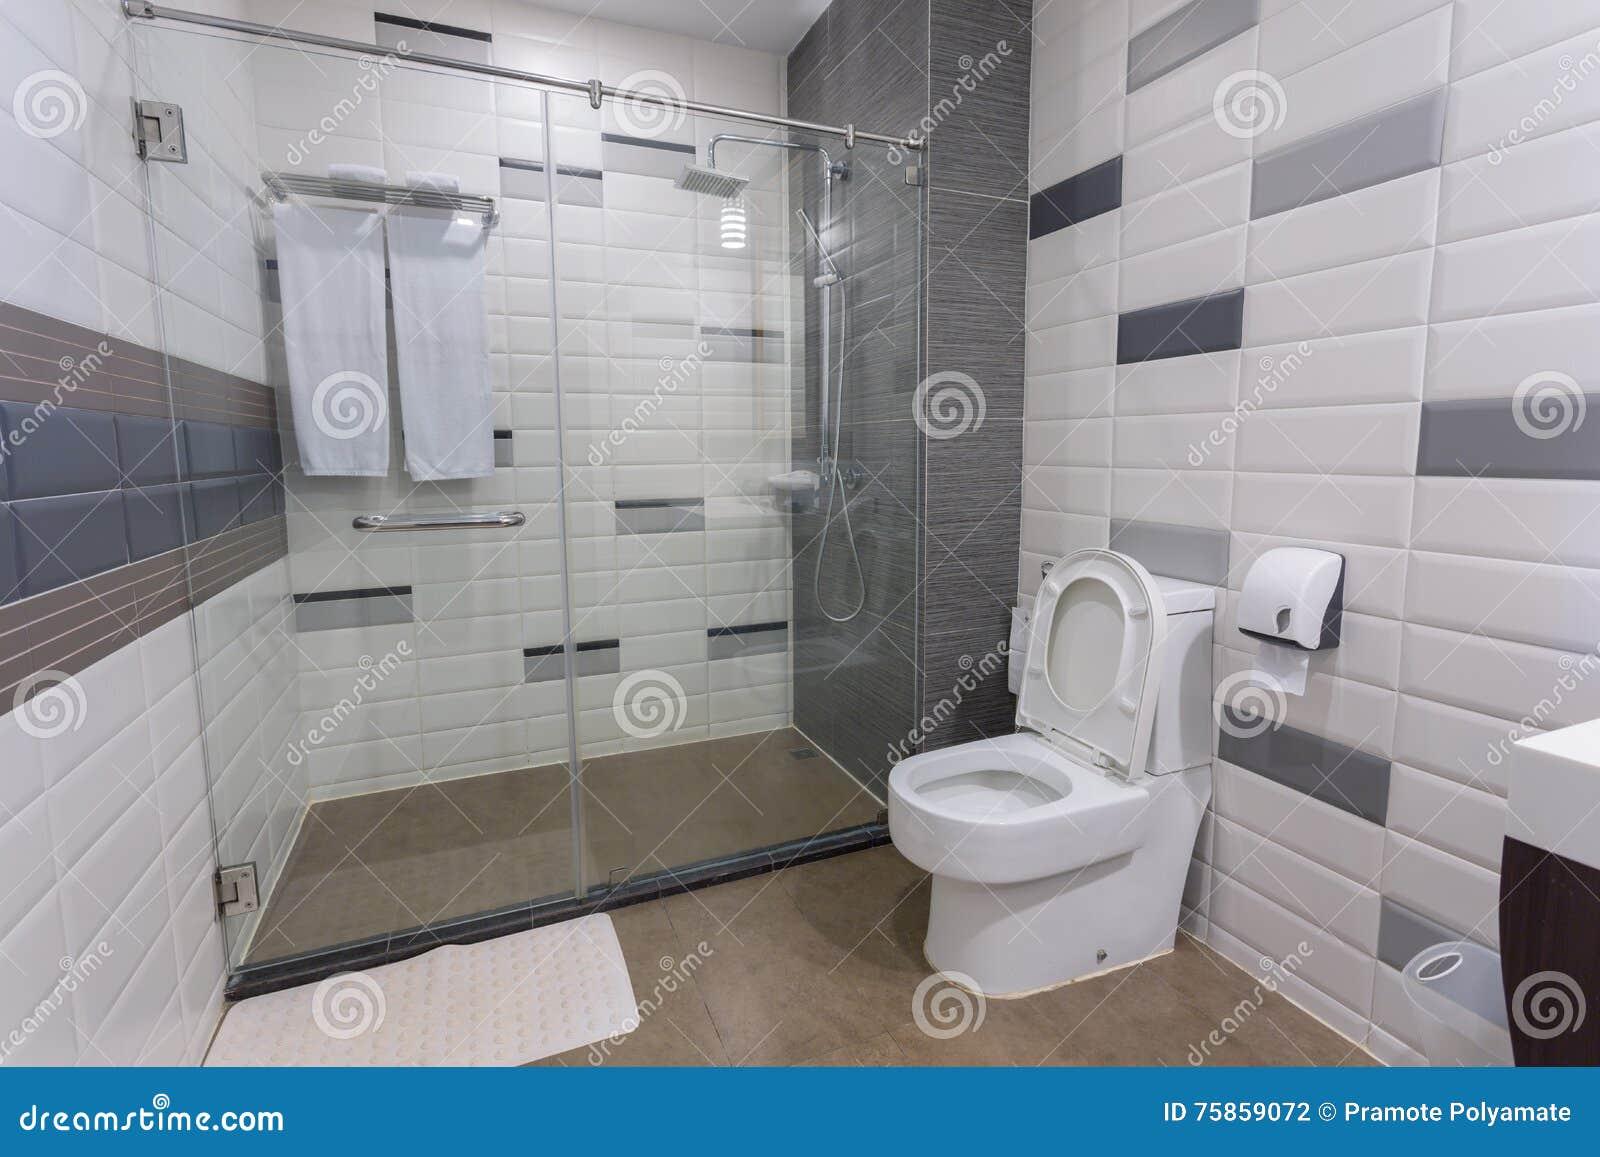 Salle de bains photo stock. Image du luxe, spacieux ...